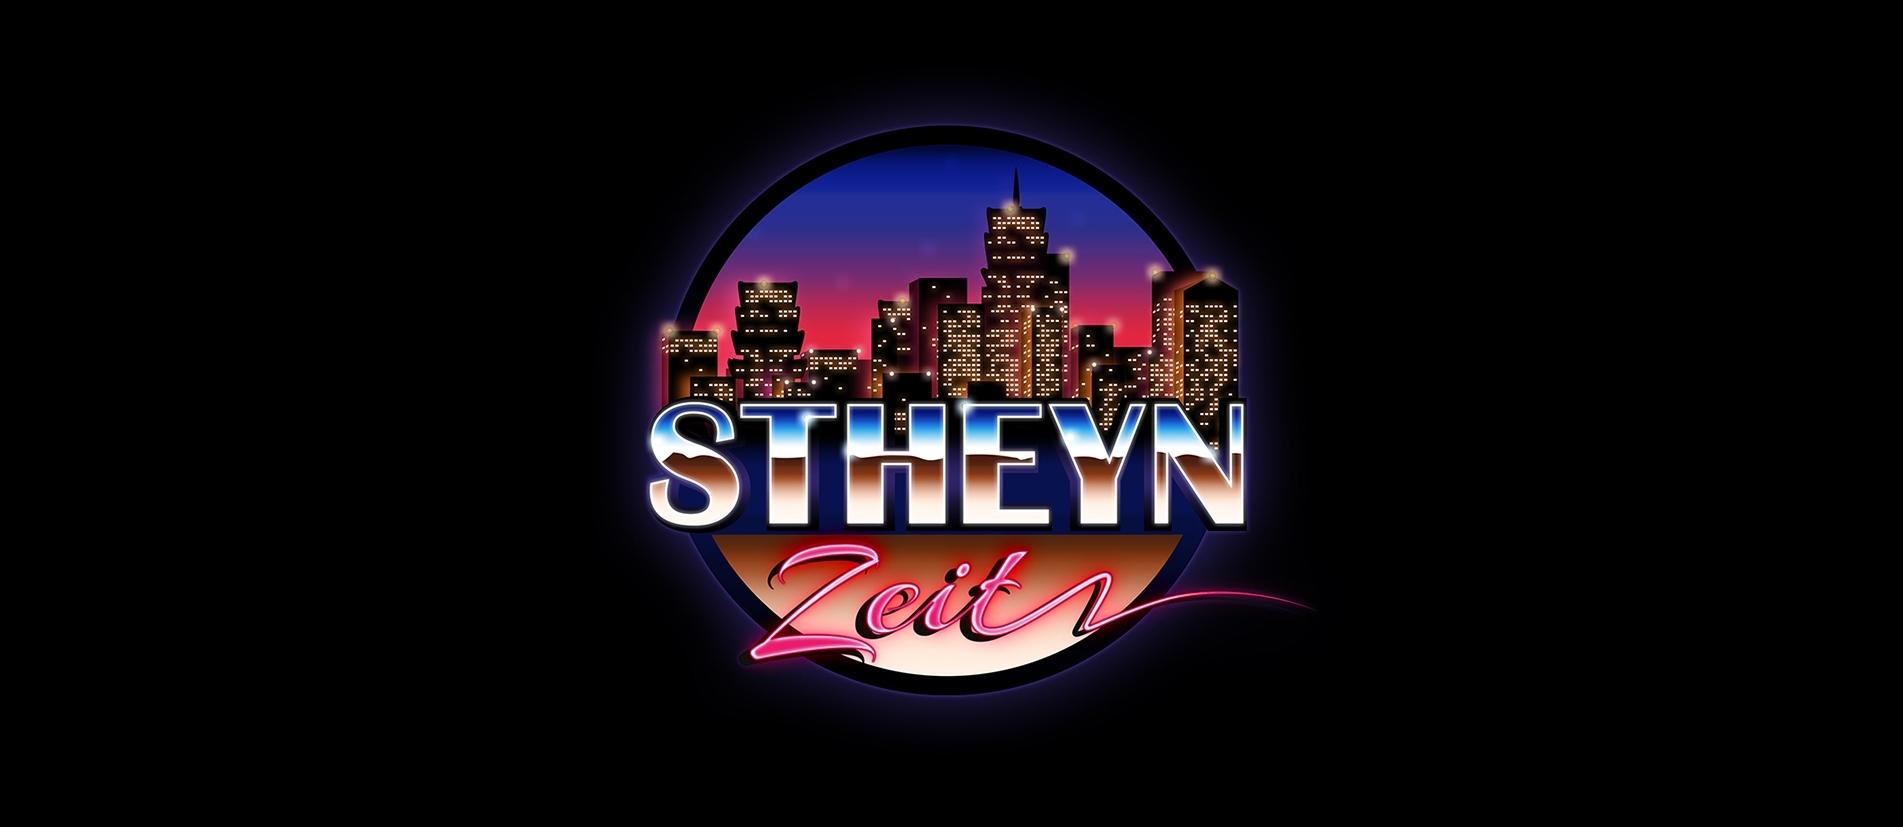 Stheyn Zeit Logo